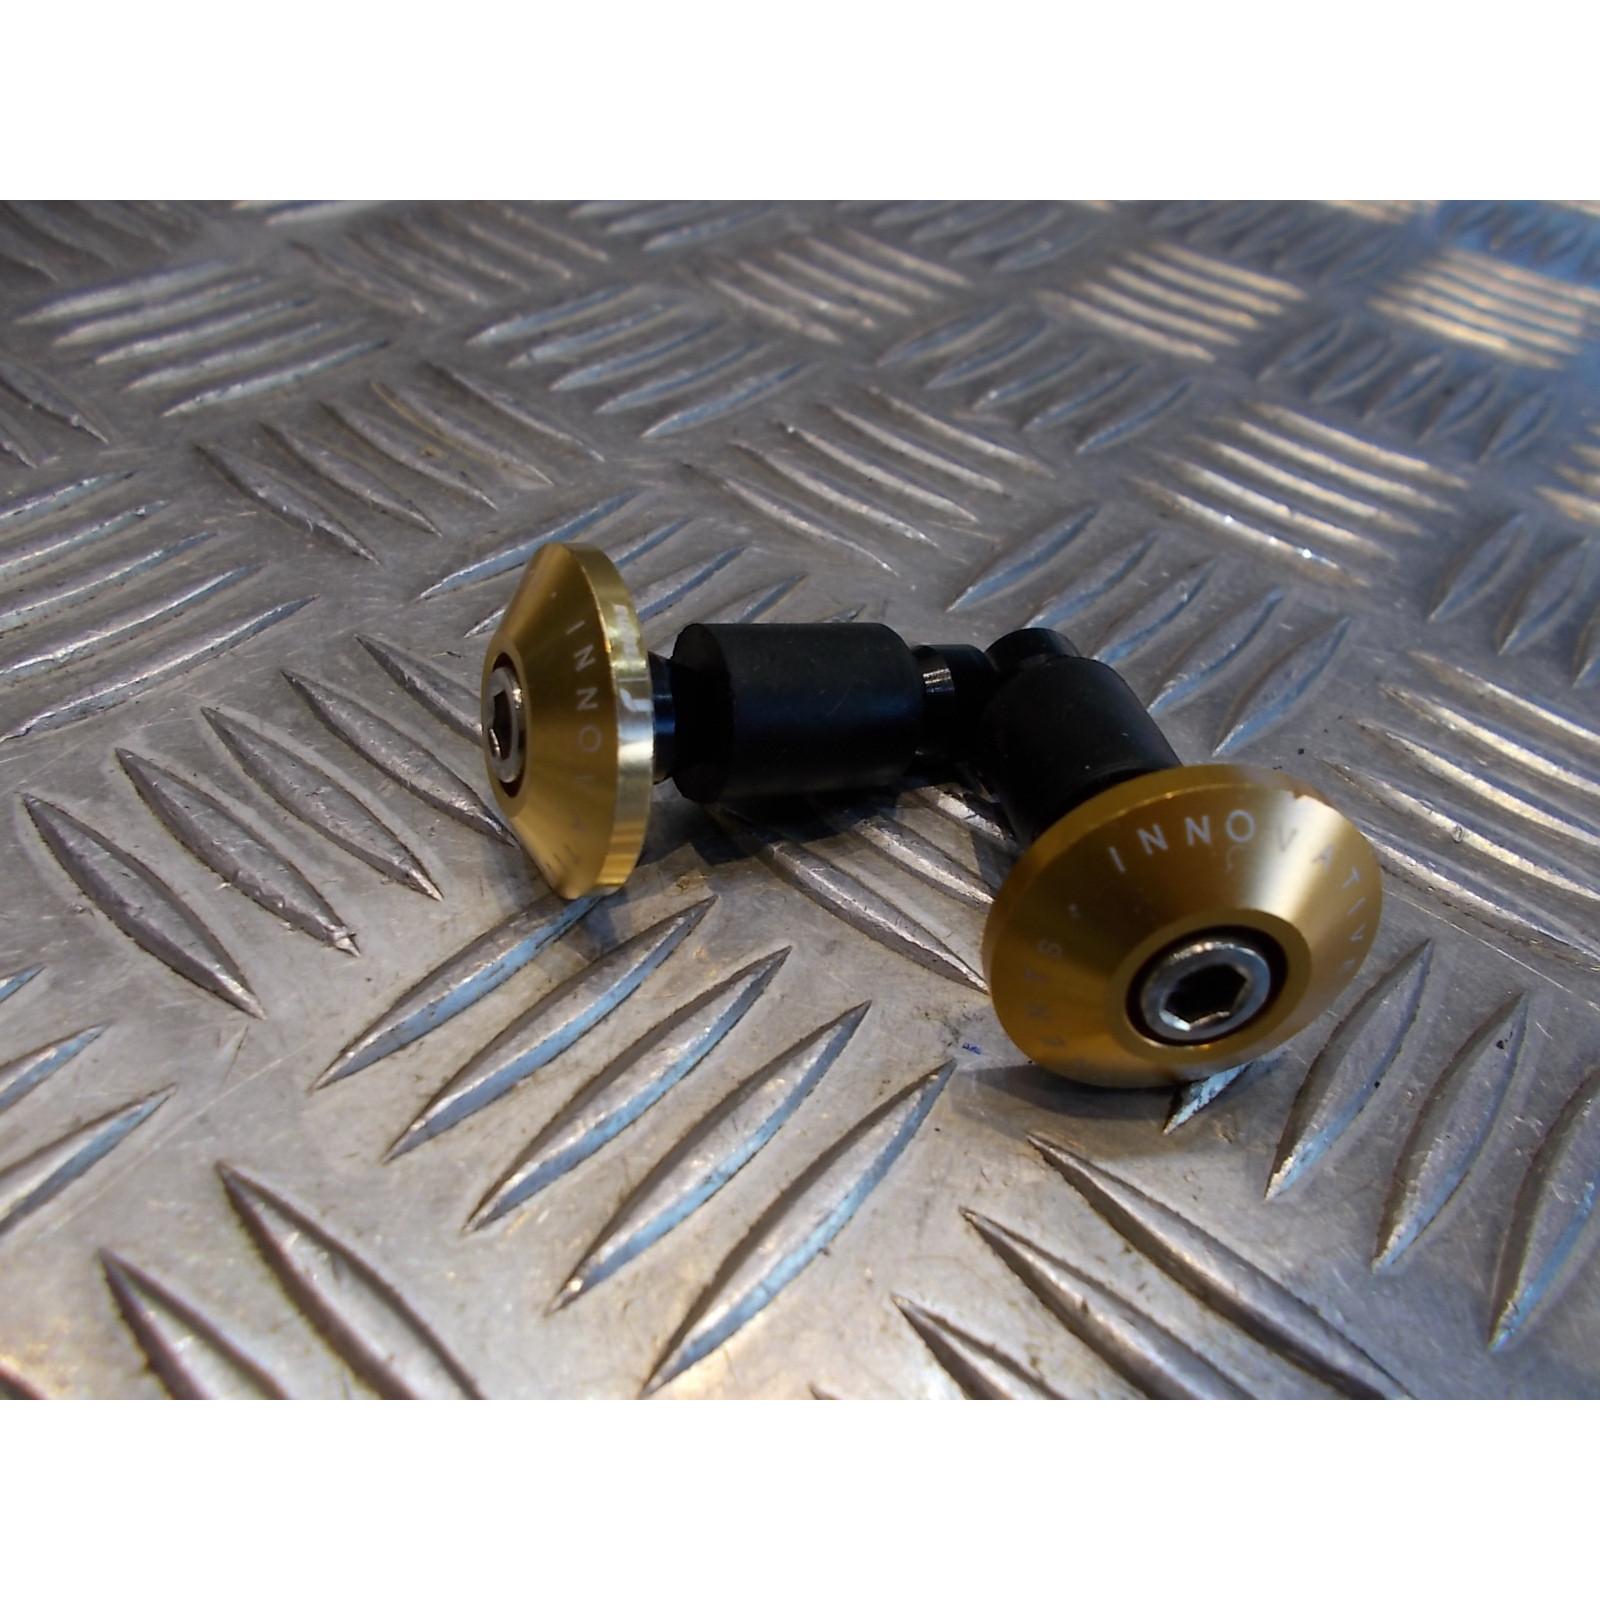 jeu embout or plat guidon diametre 22 mm moto scooter universel adaptable quad